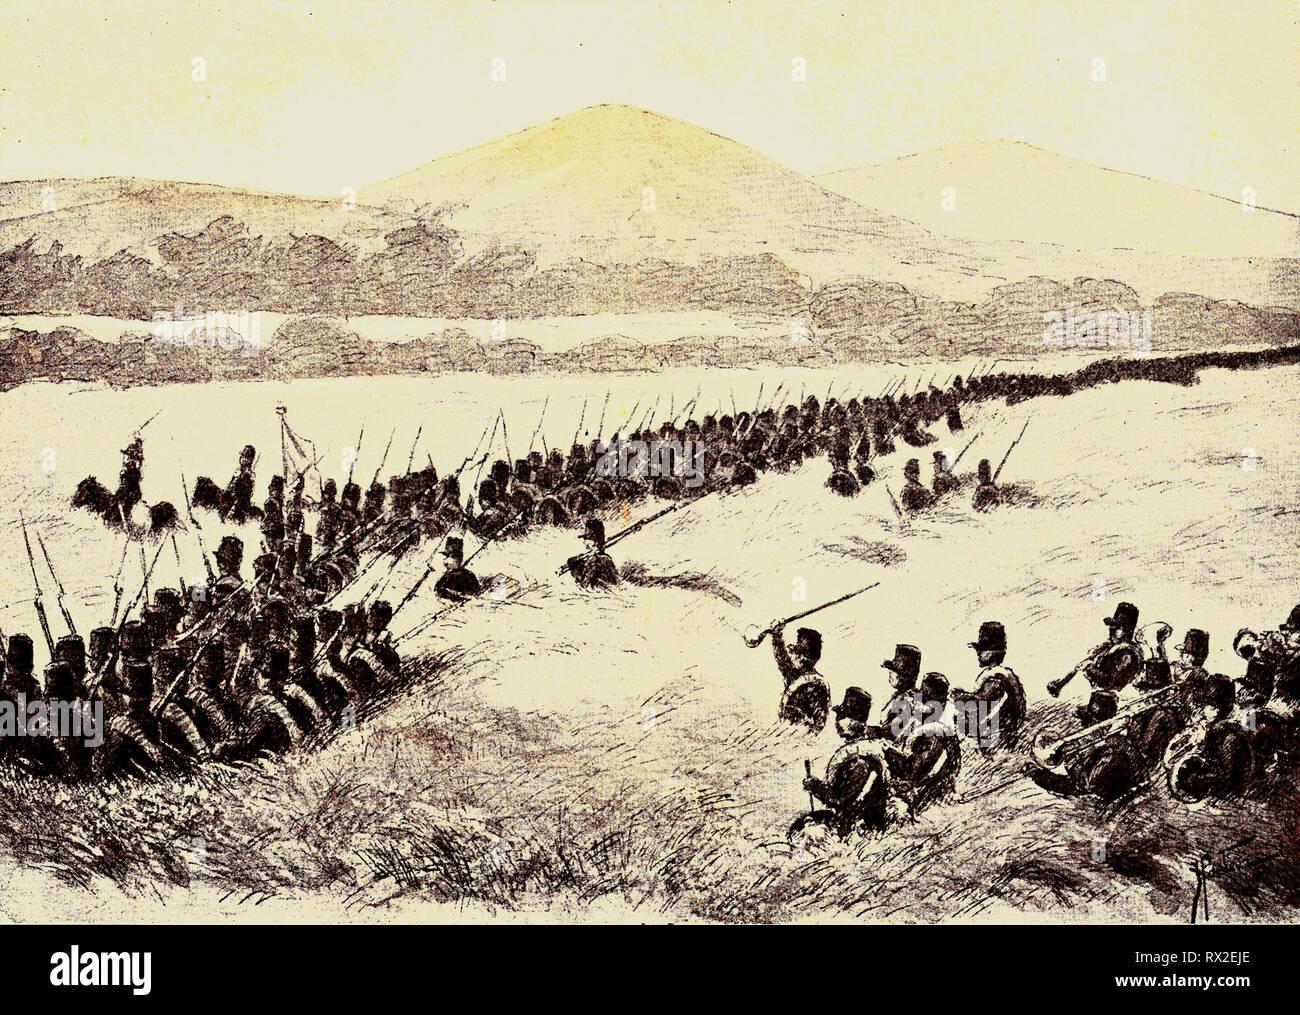 The Dutch 7th Battalion advancing in Bali in 1846. - Stock Image